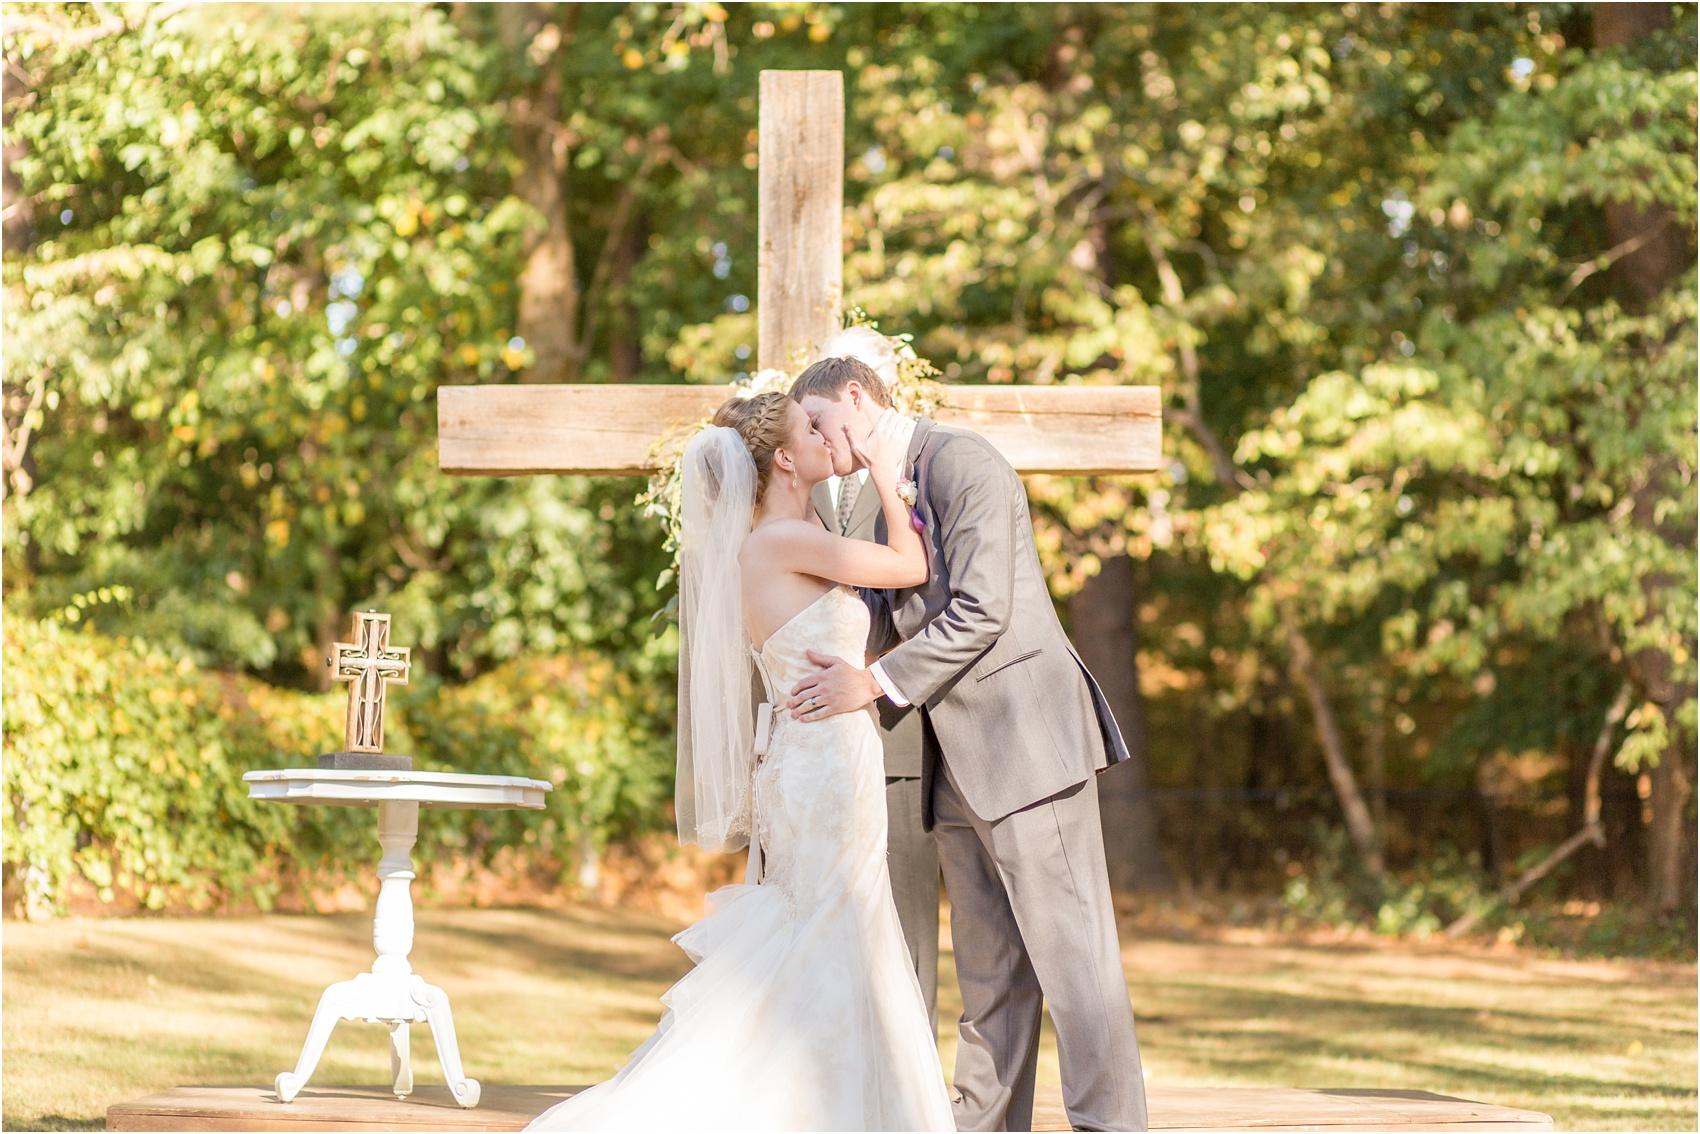 Savannah Eve Photography- Perkins Wedding- Blog-48.jpg